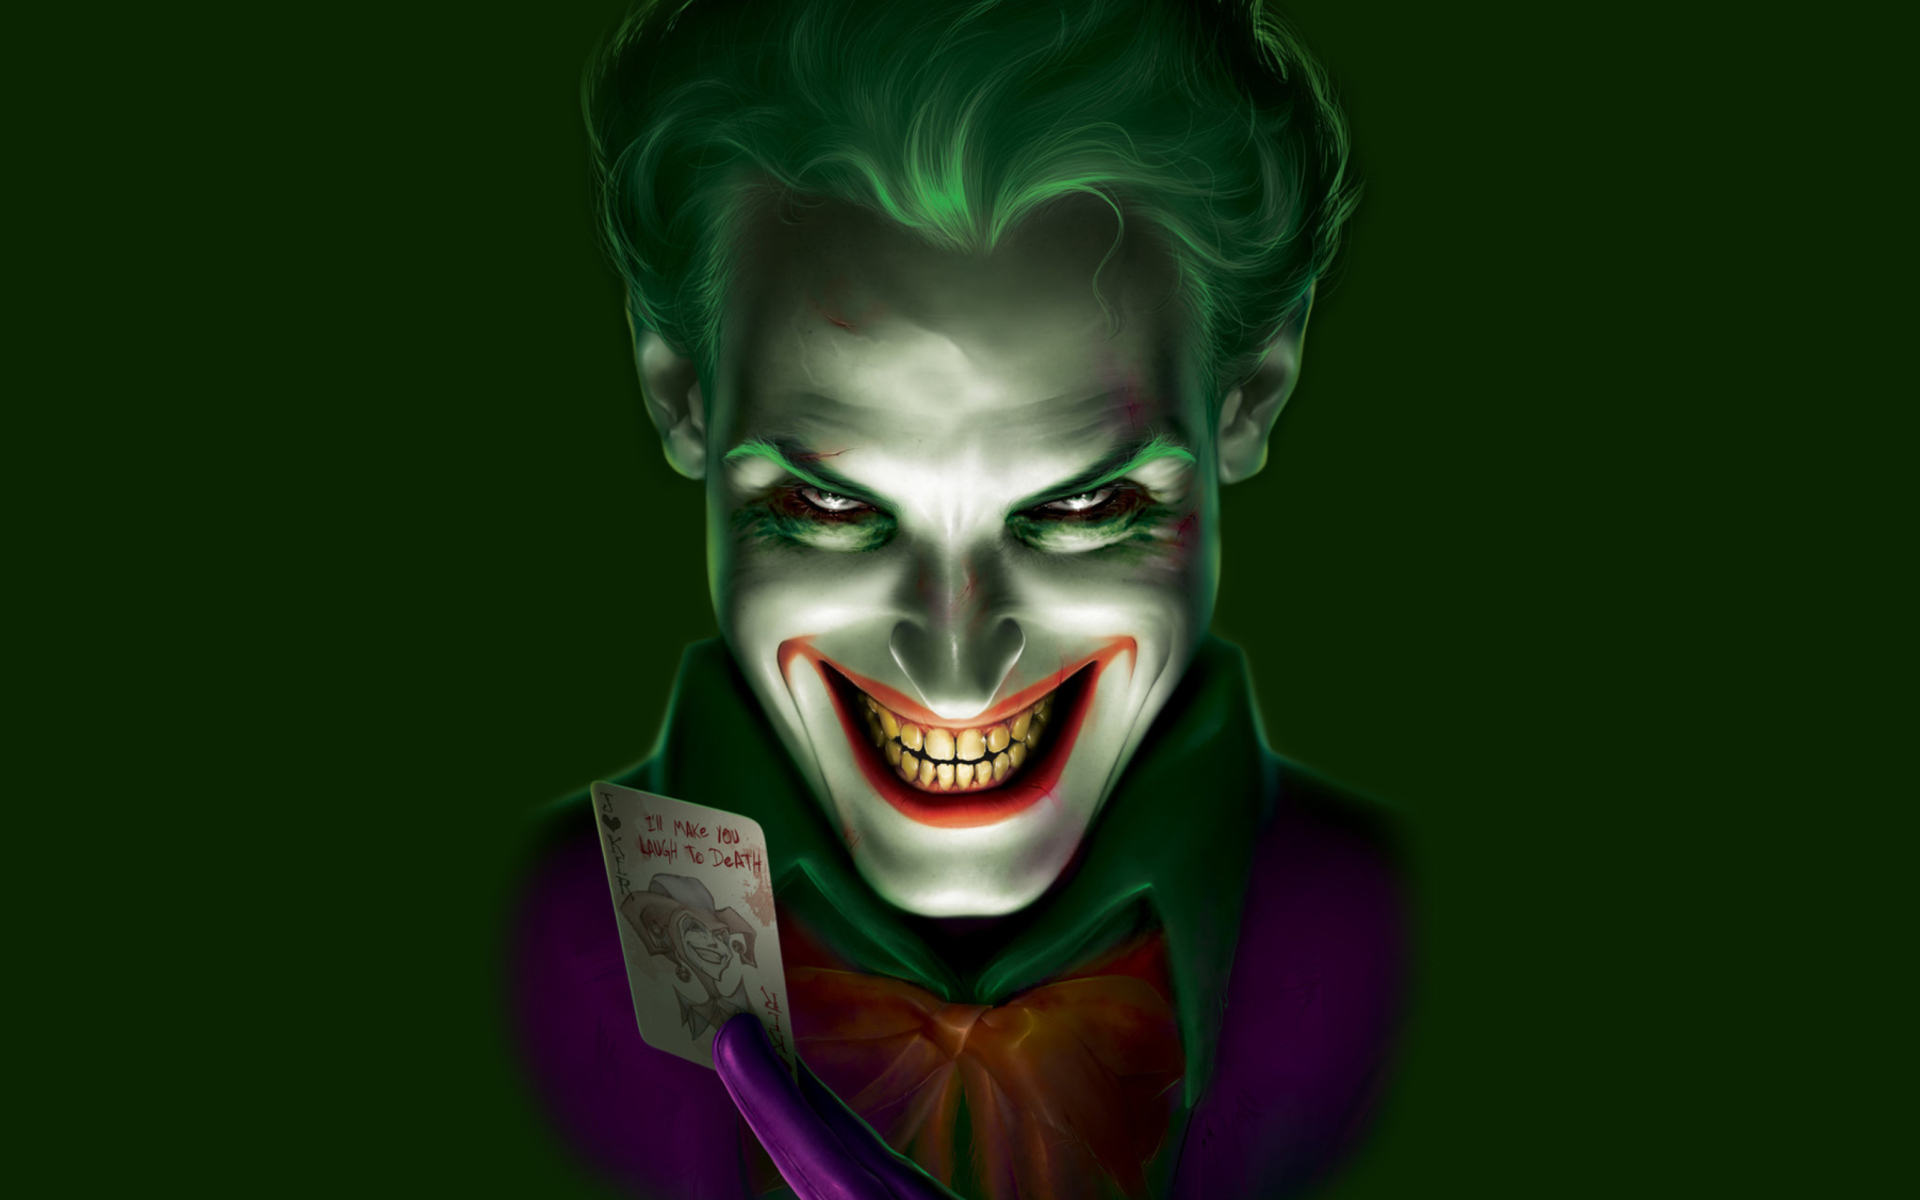 Joker Hd Desktop Wallpaper High Definition Fullscreen Mobile